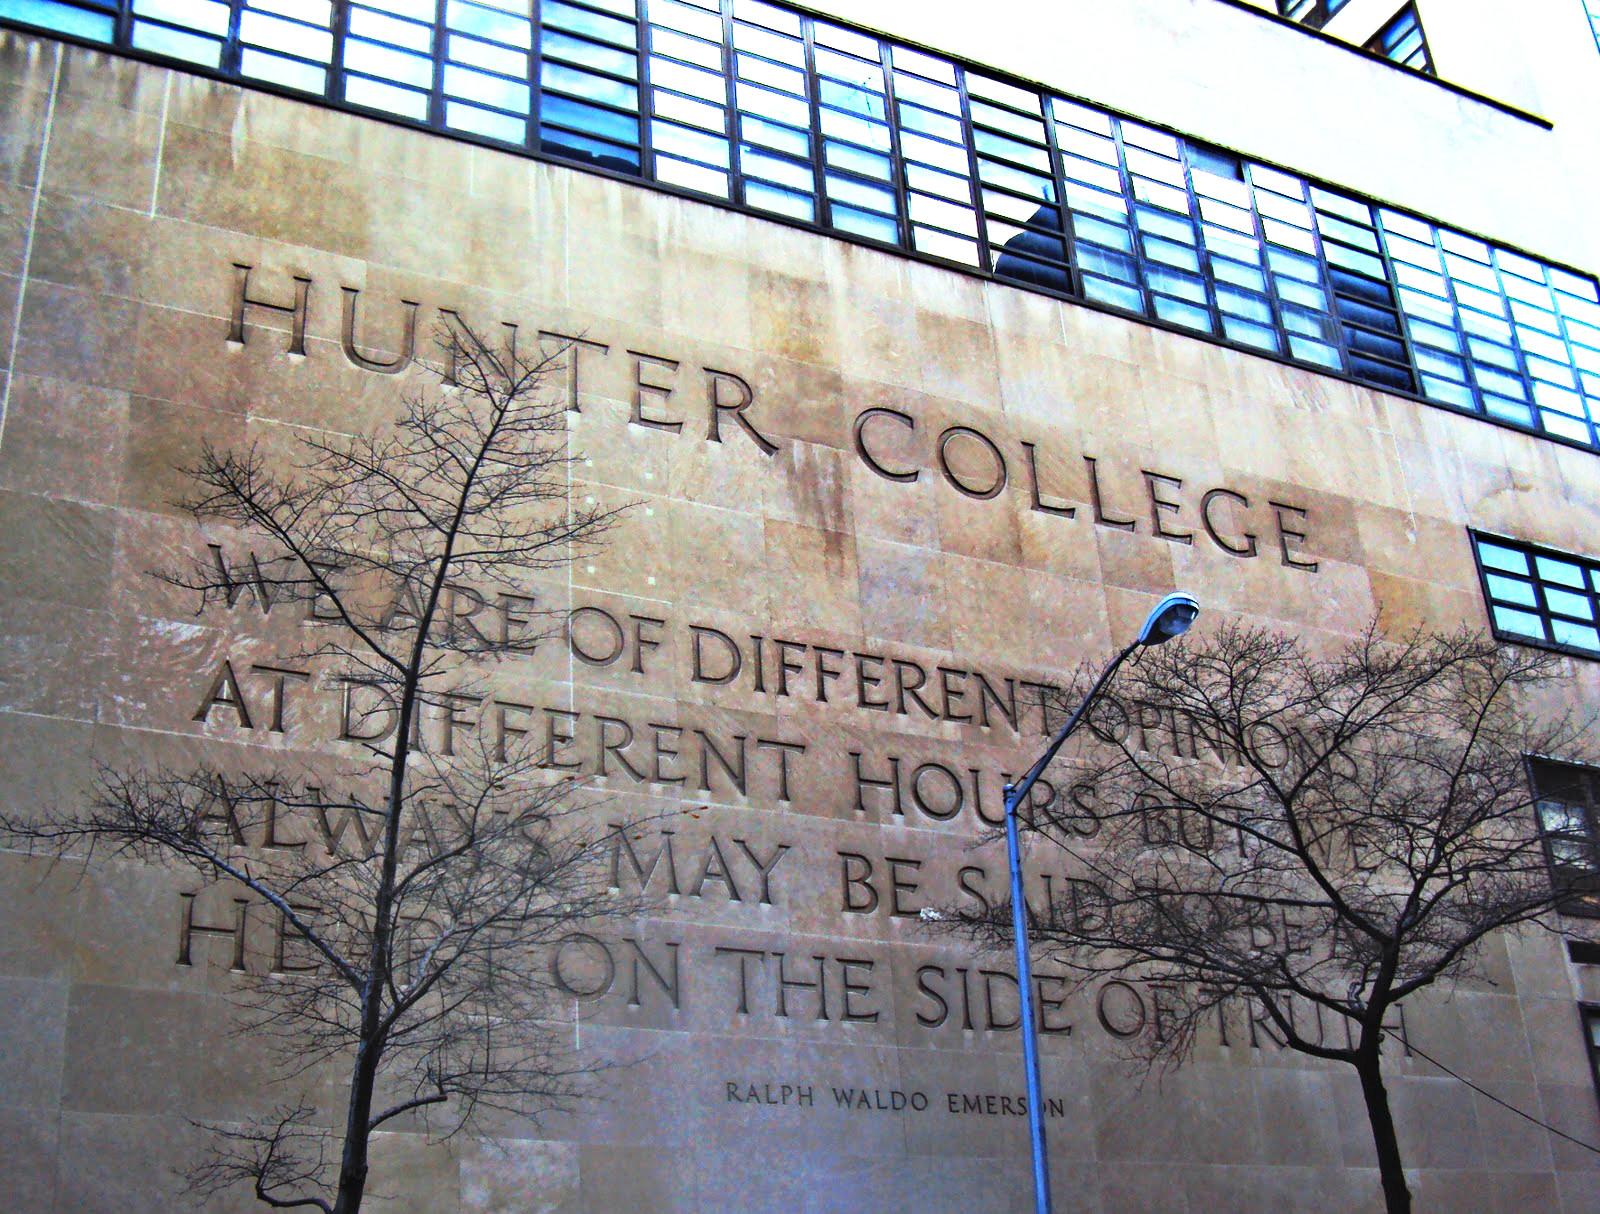 Hunter College 1